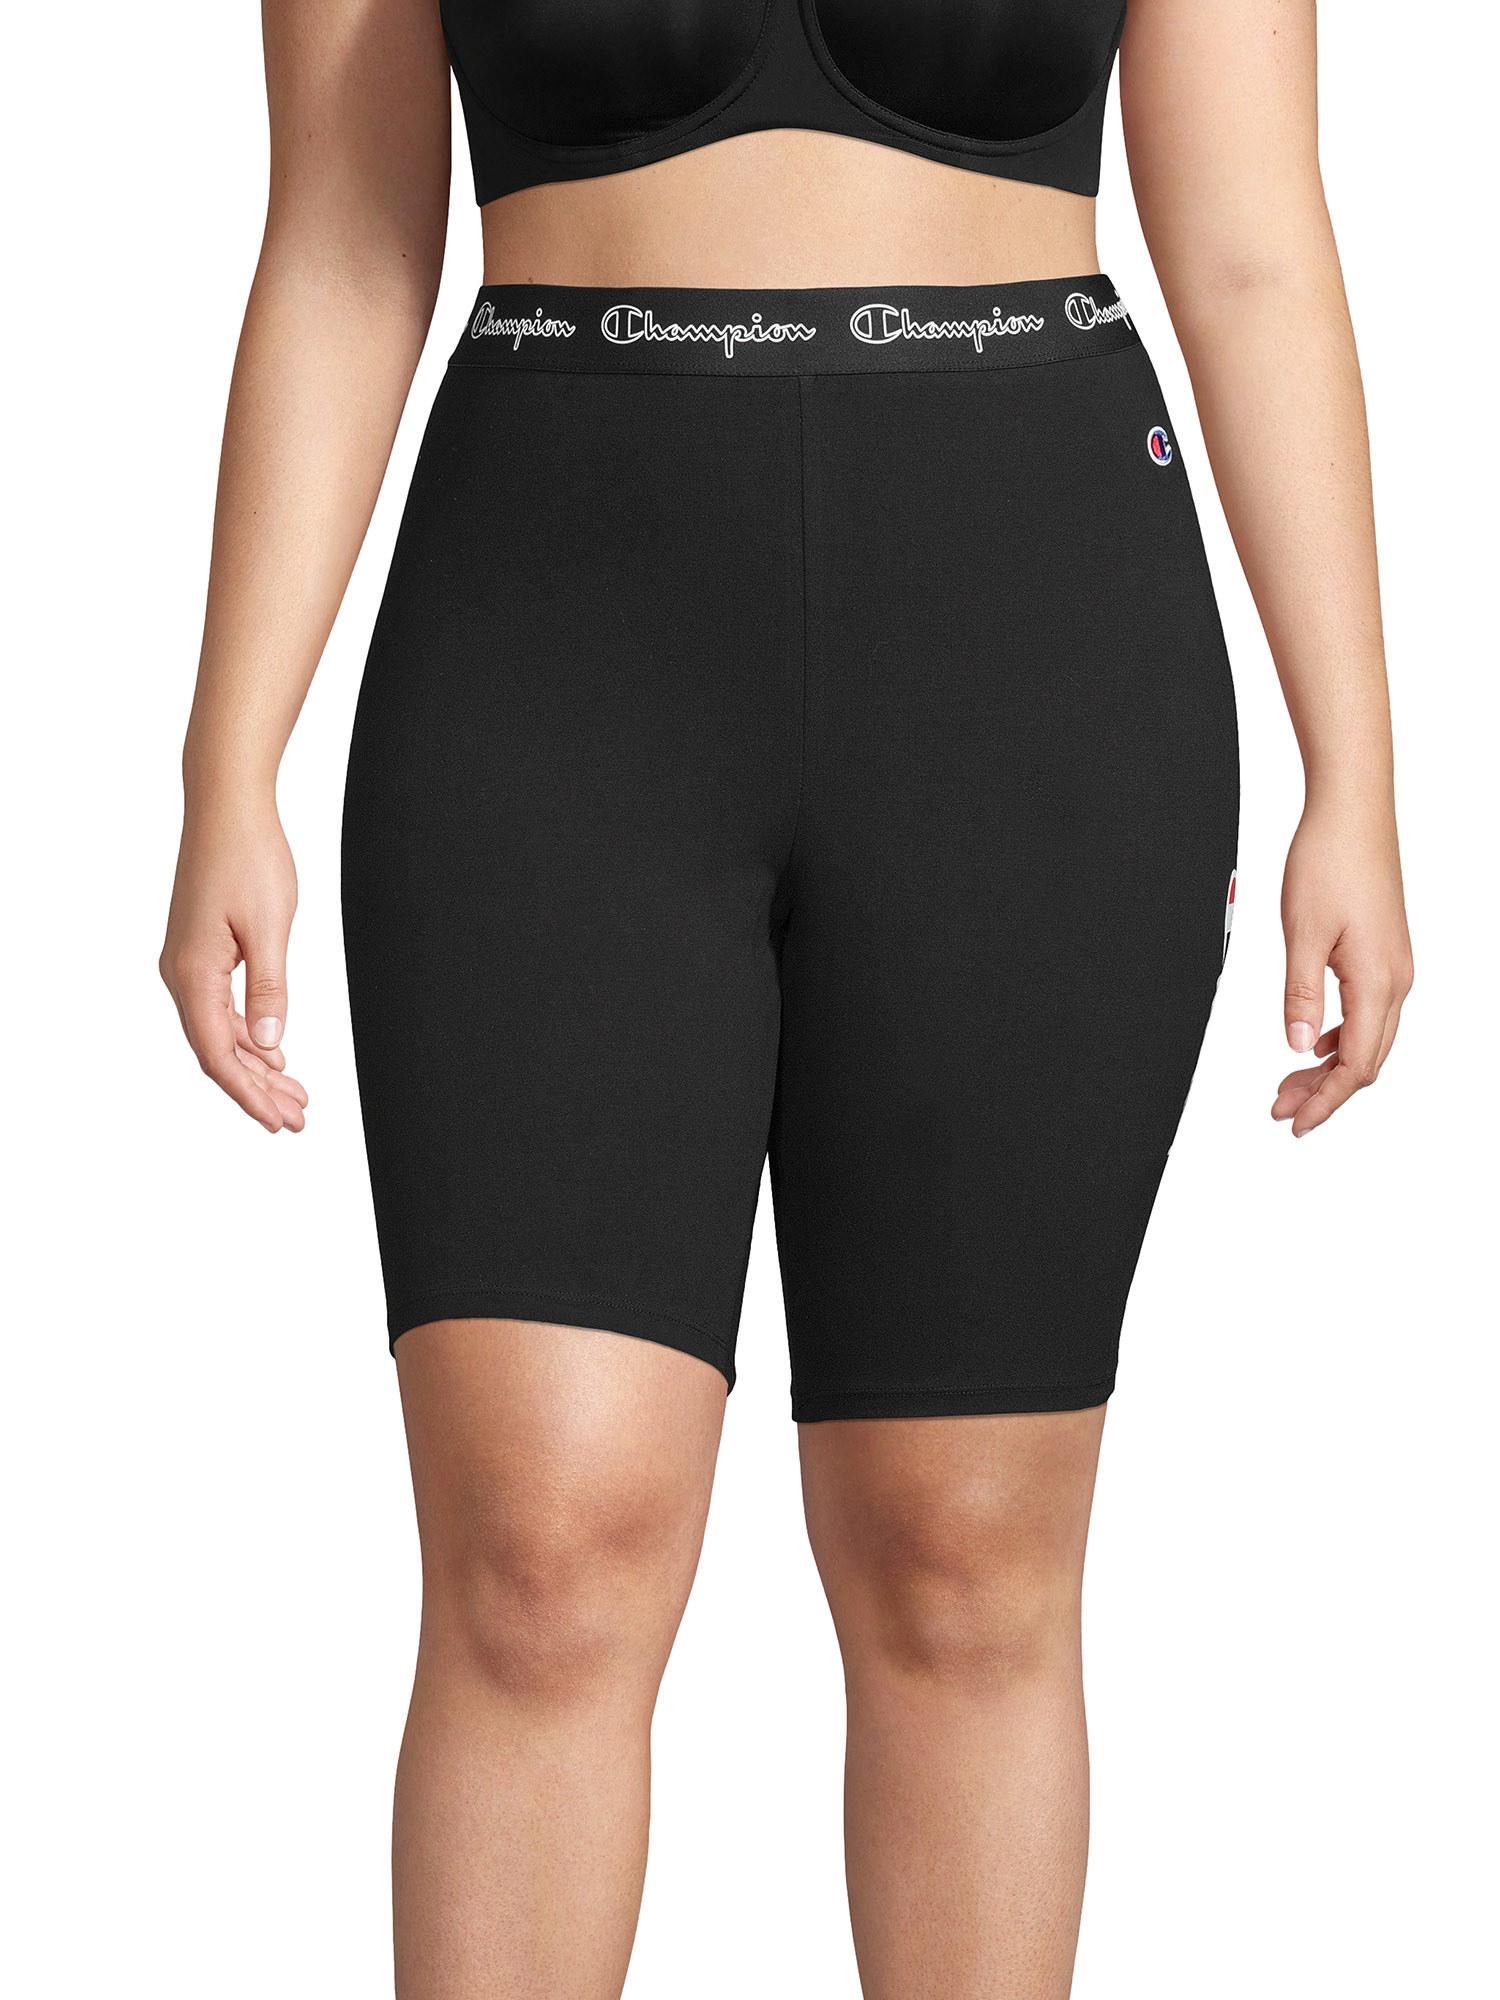 person wearing black athletic bike shorts